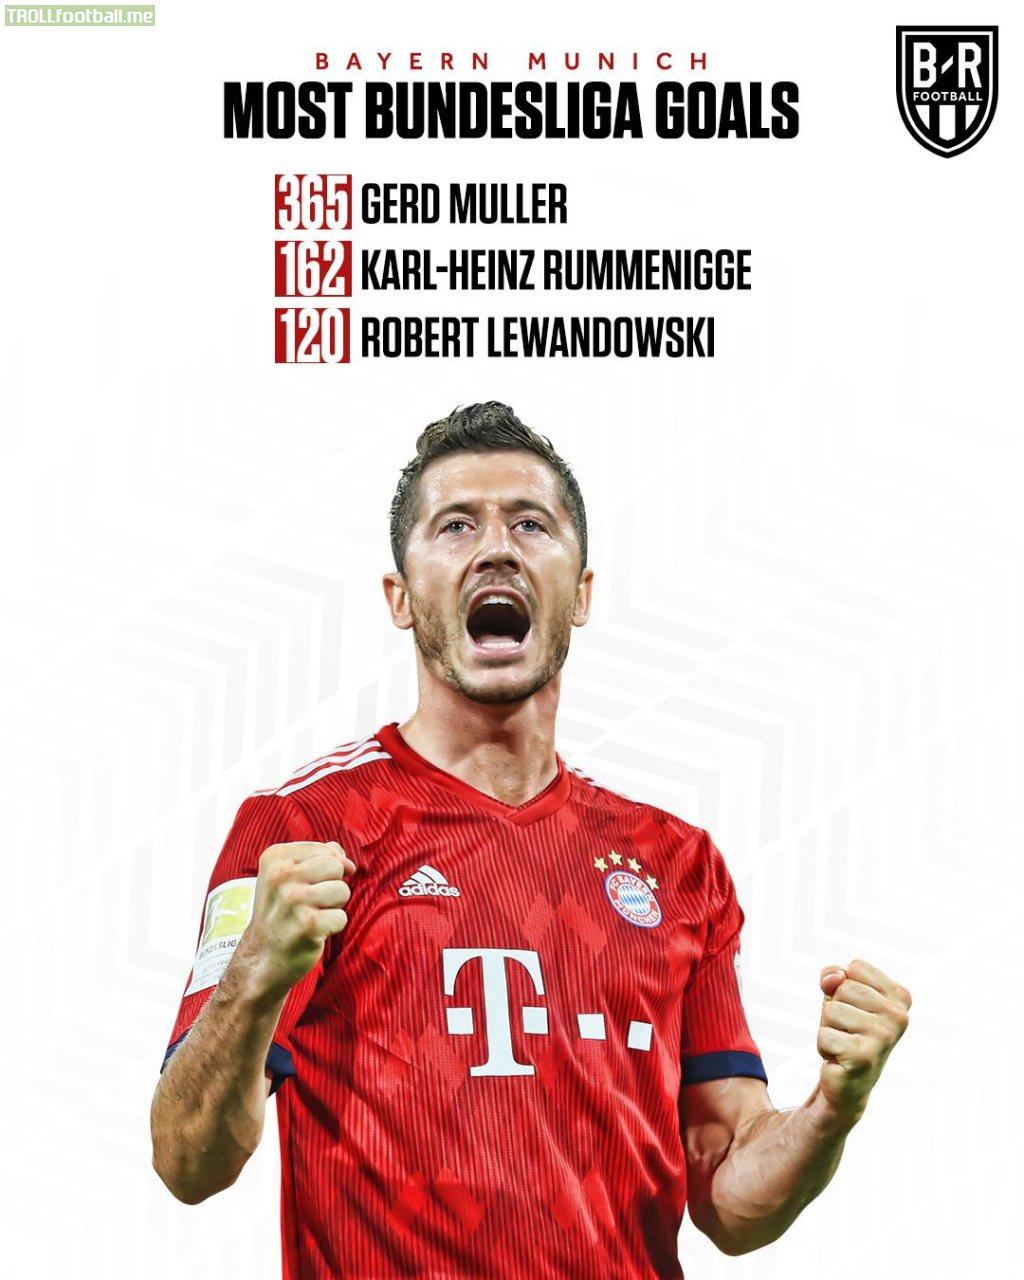 Robert Lewandowski is now Bayern's third-highest Bundesliga scorer in their history